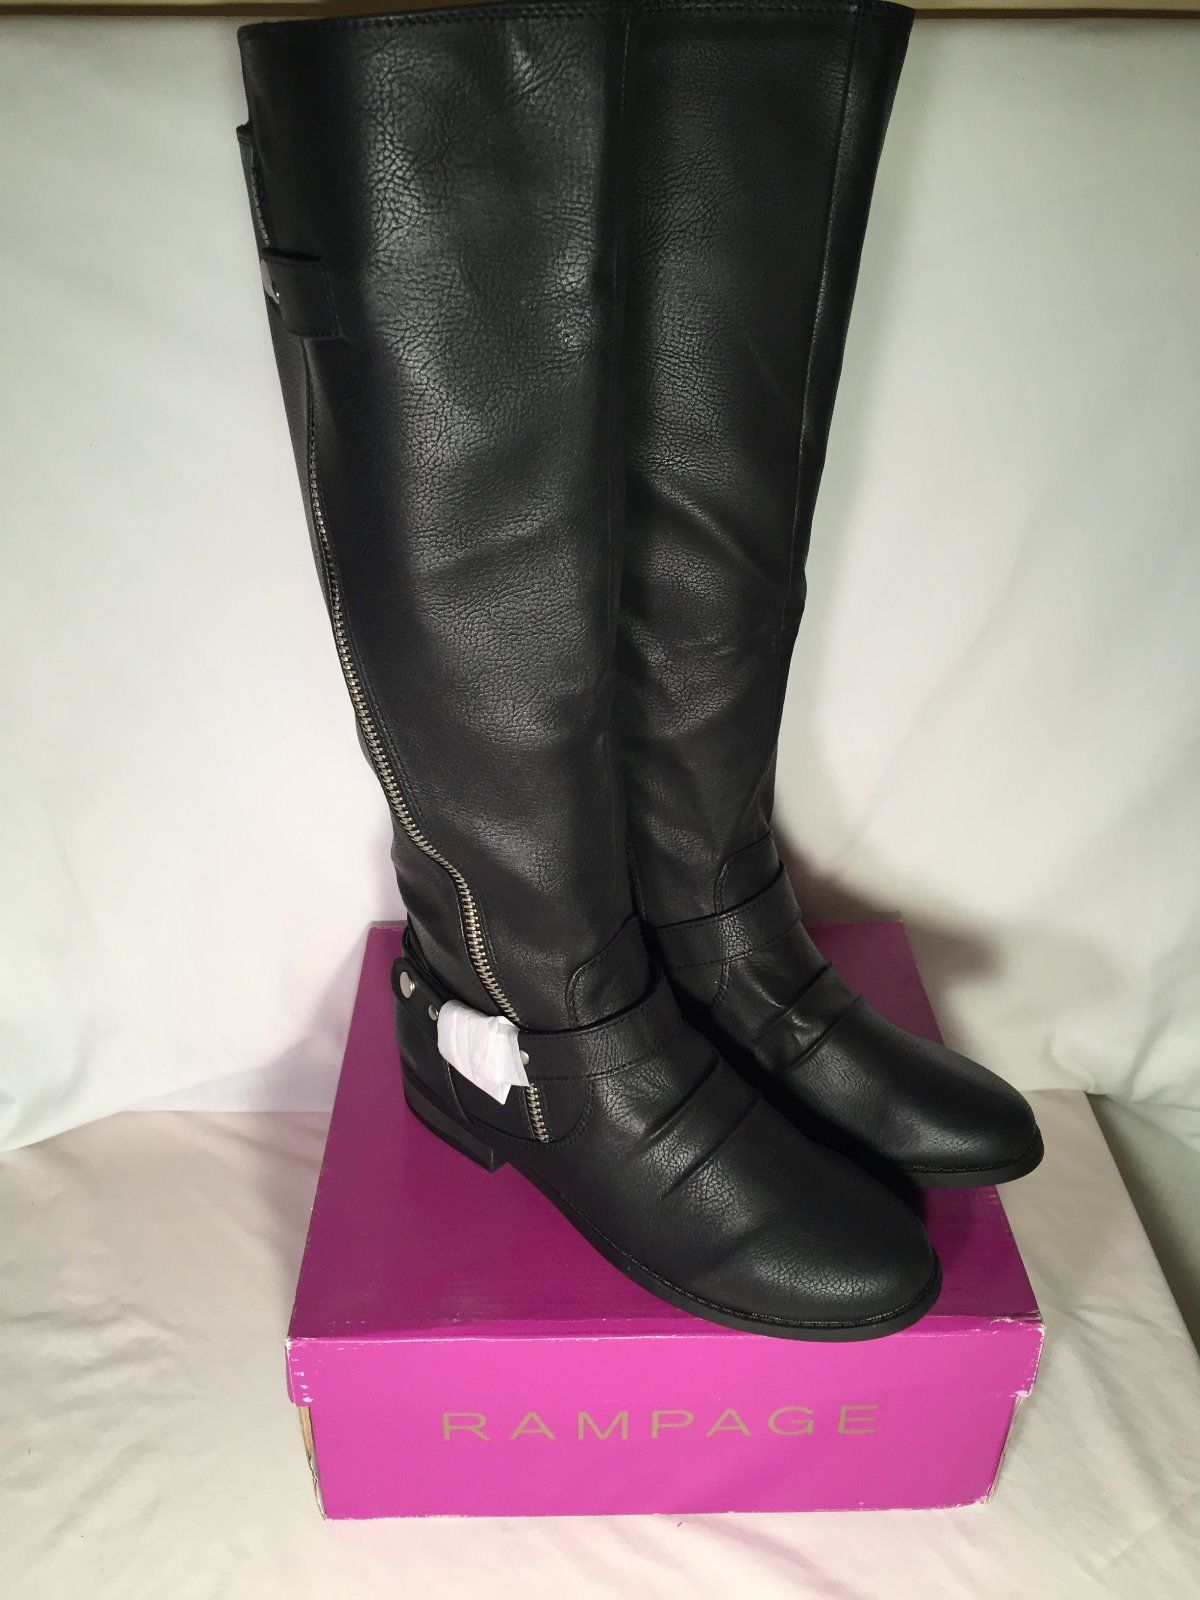 rage iverlee s knee high black sm boots